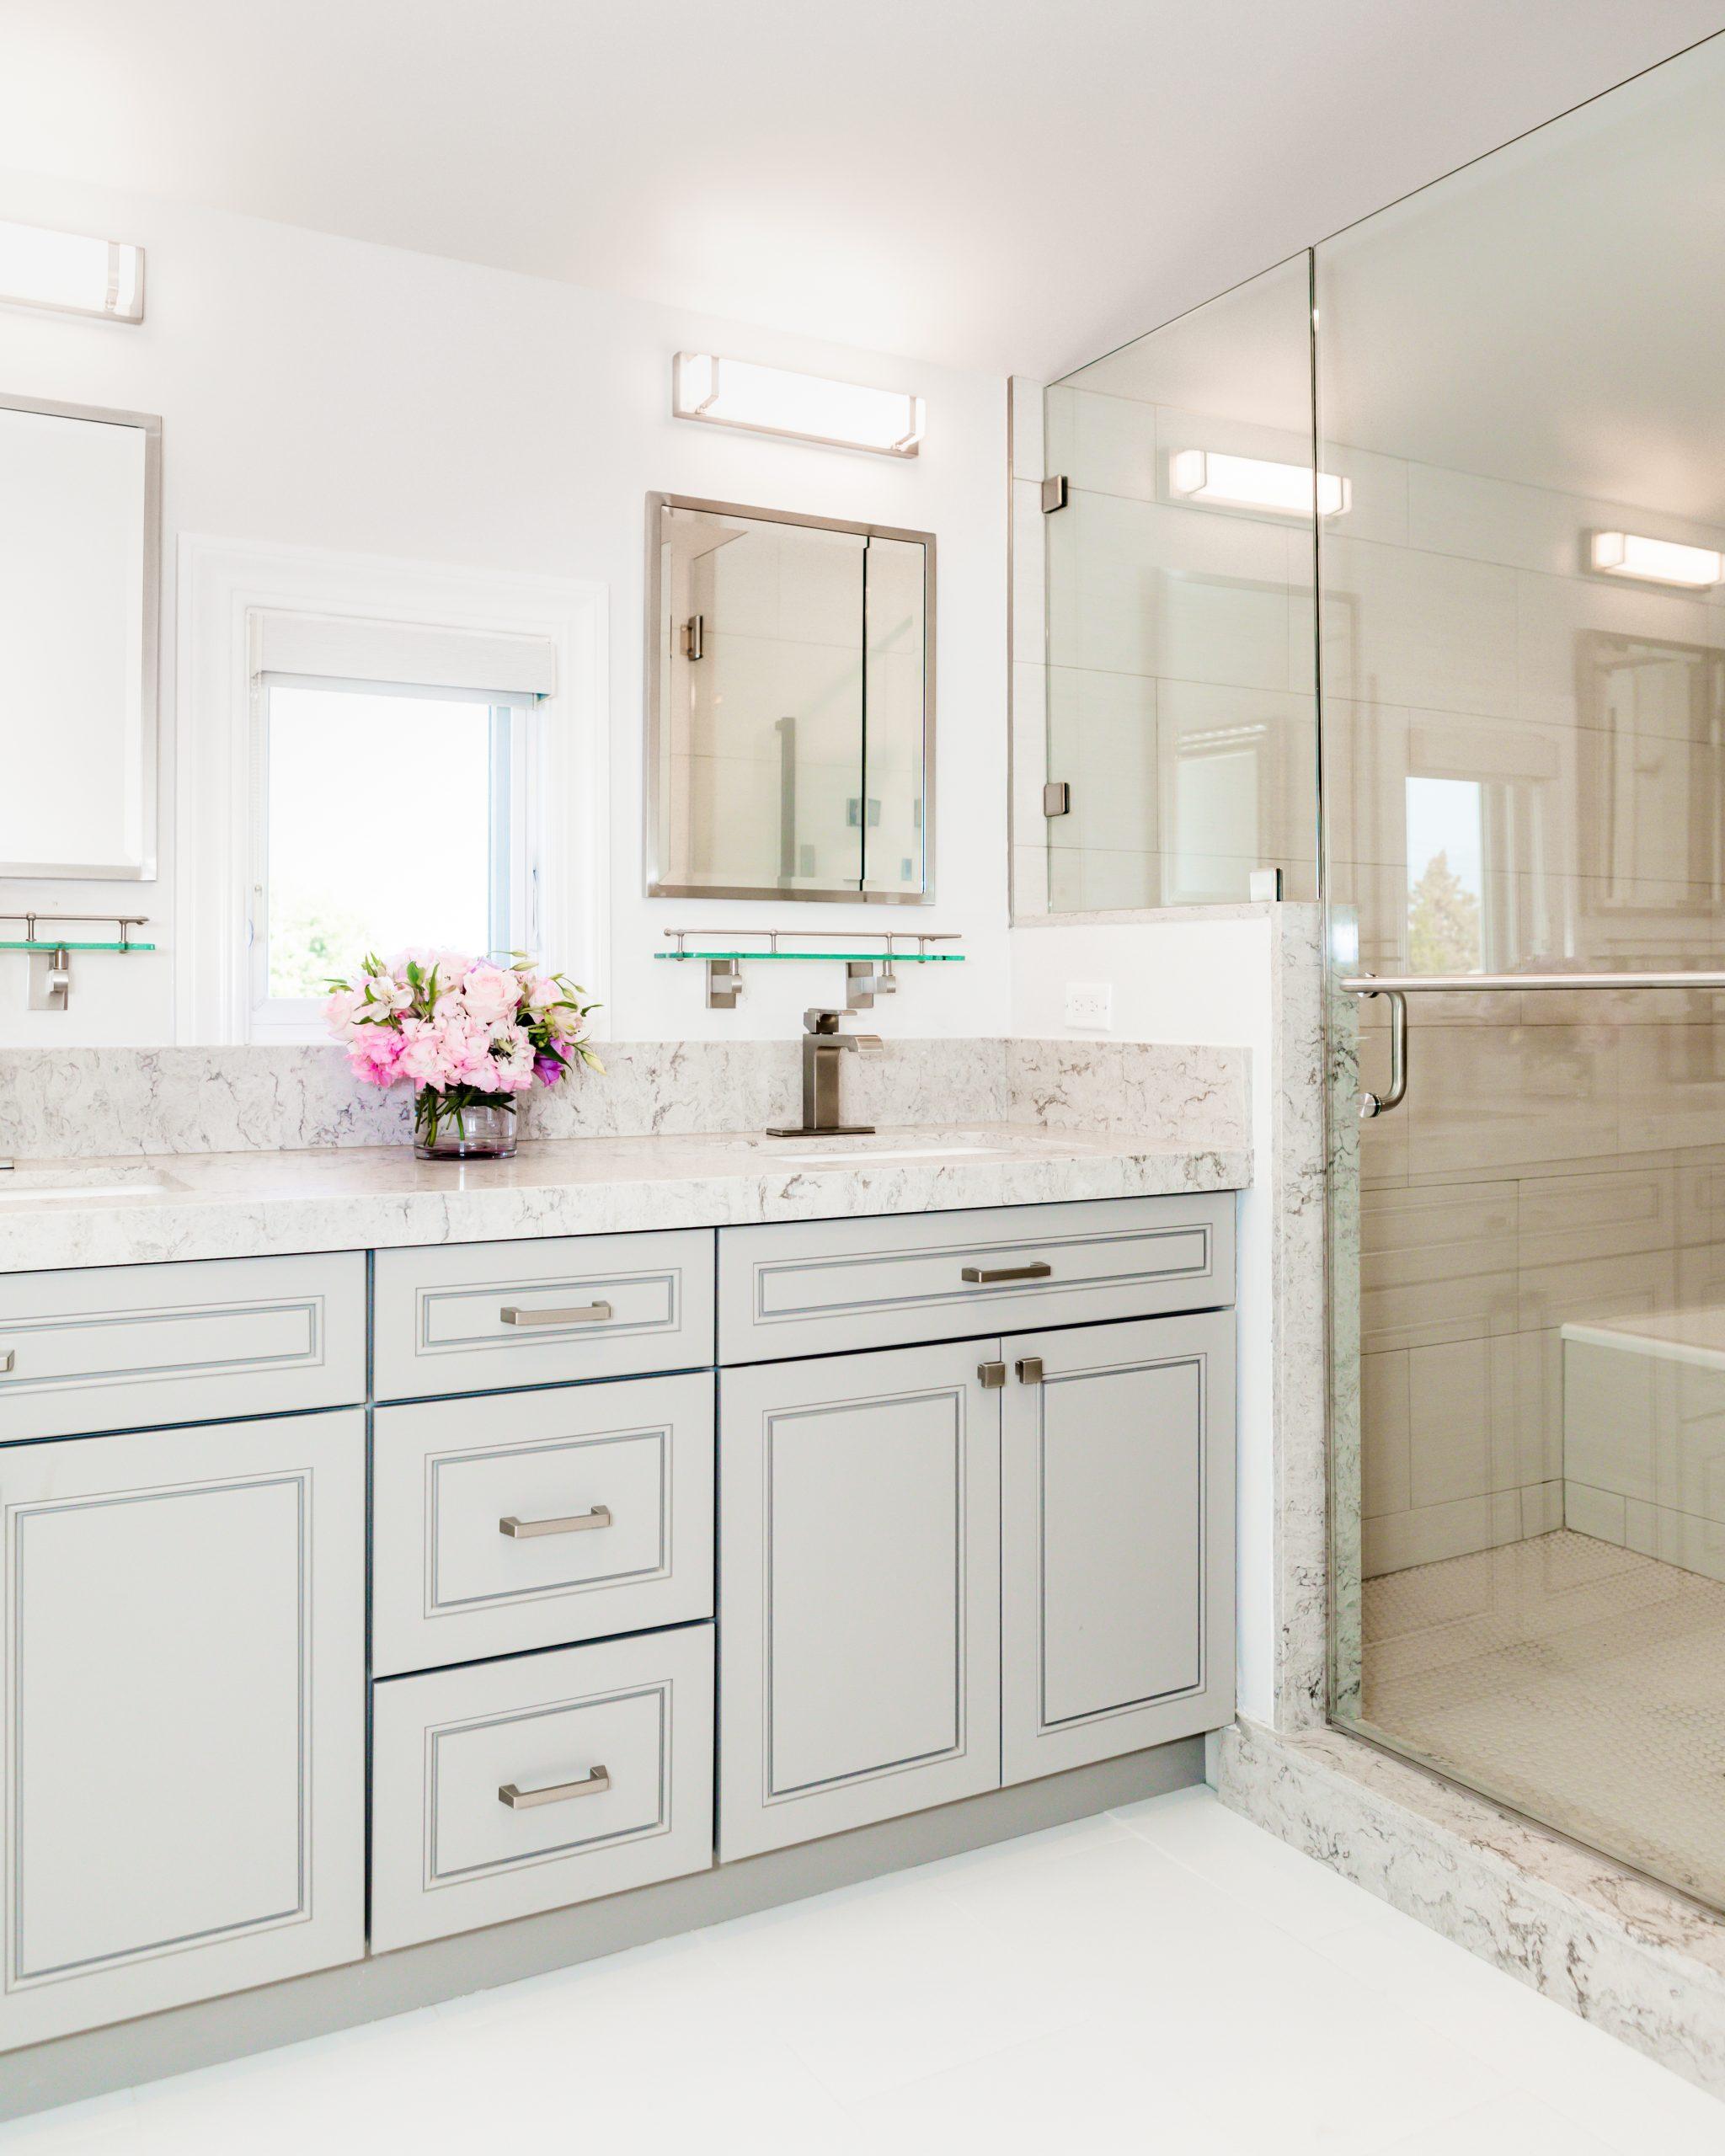 custom bathroom cabinets with double sinks